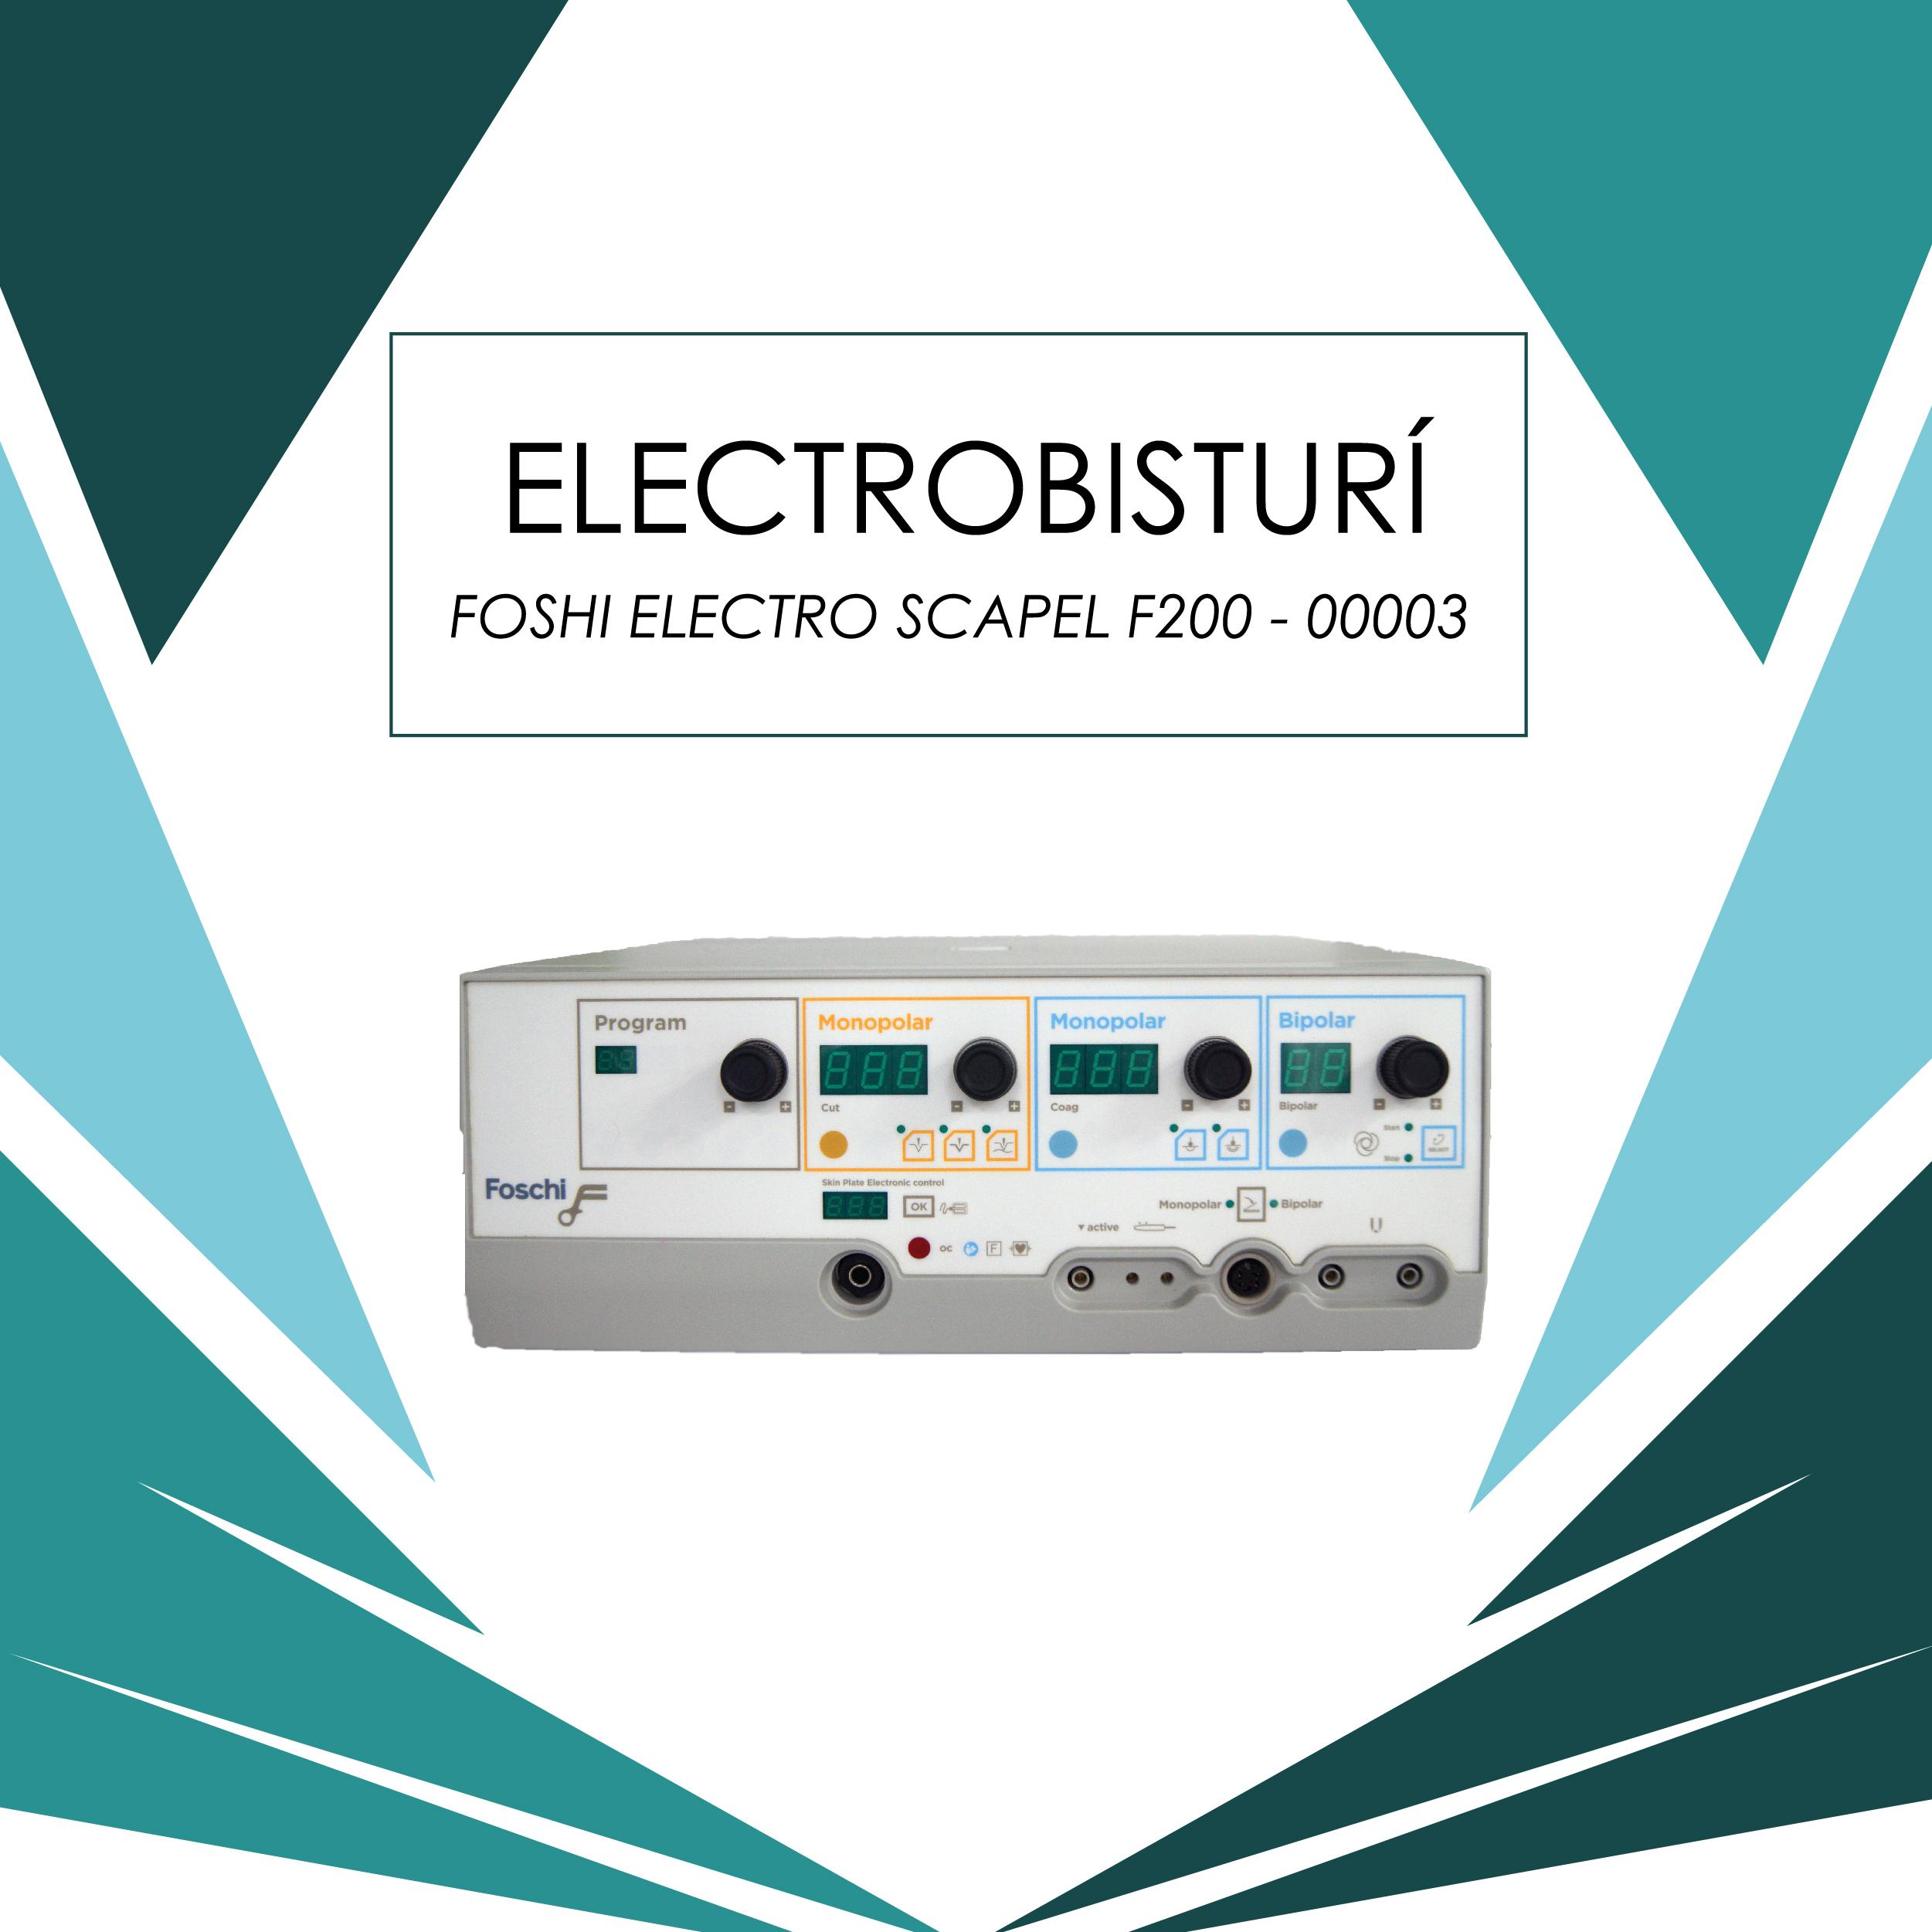 Catálogo electrobisturí